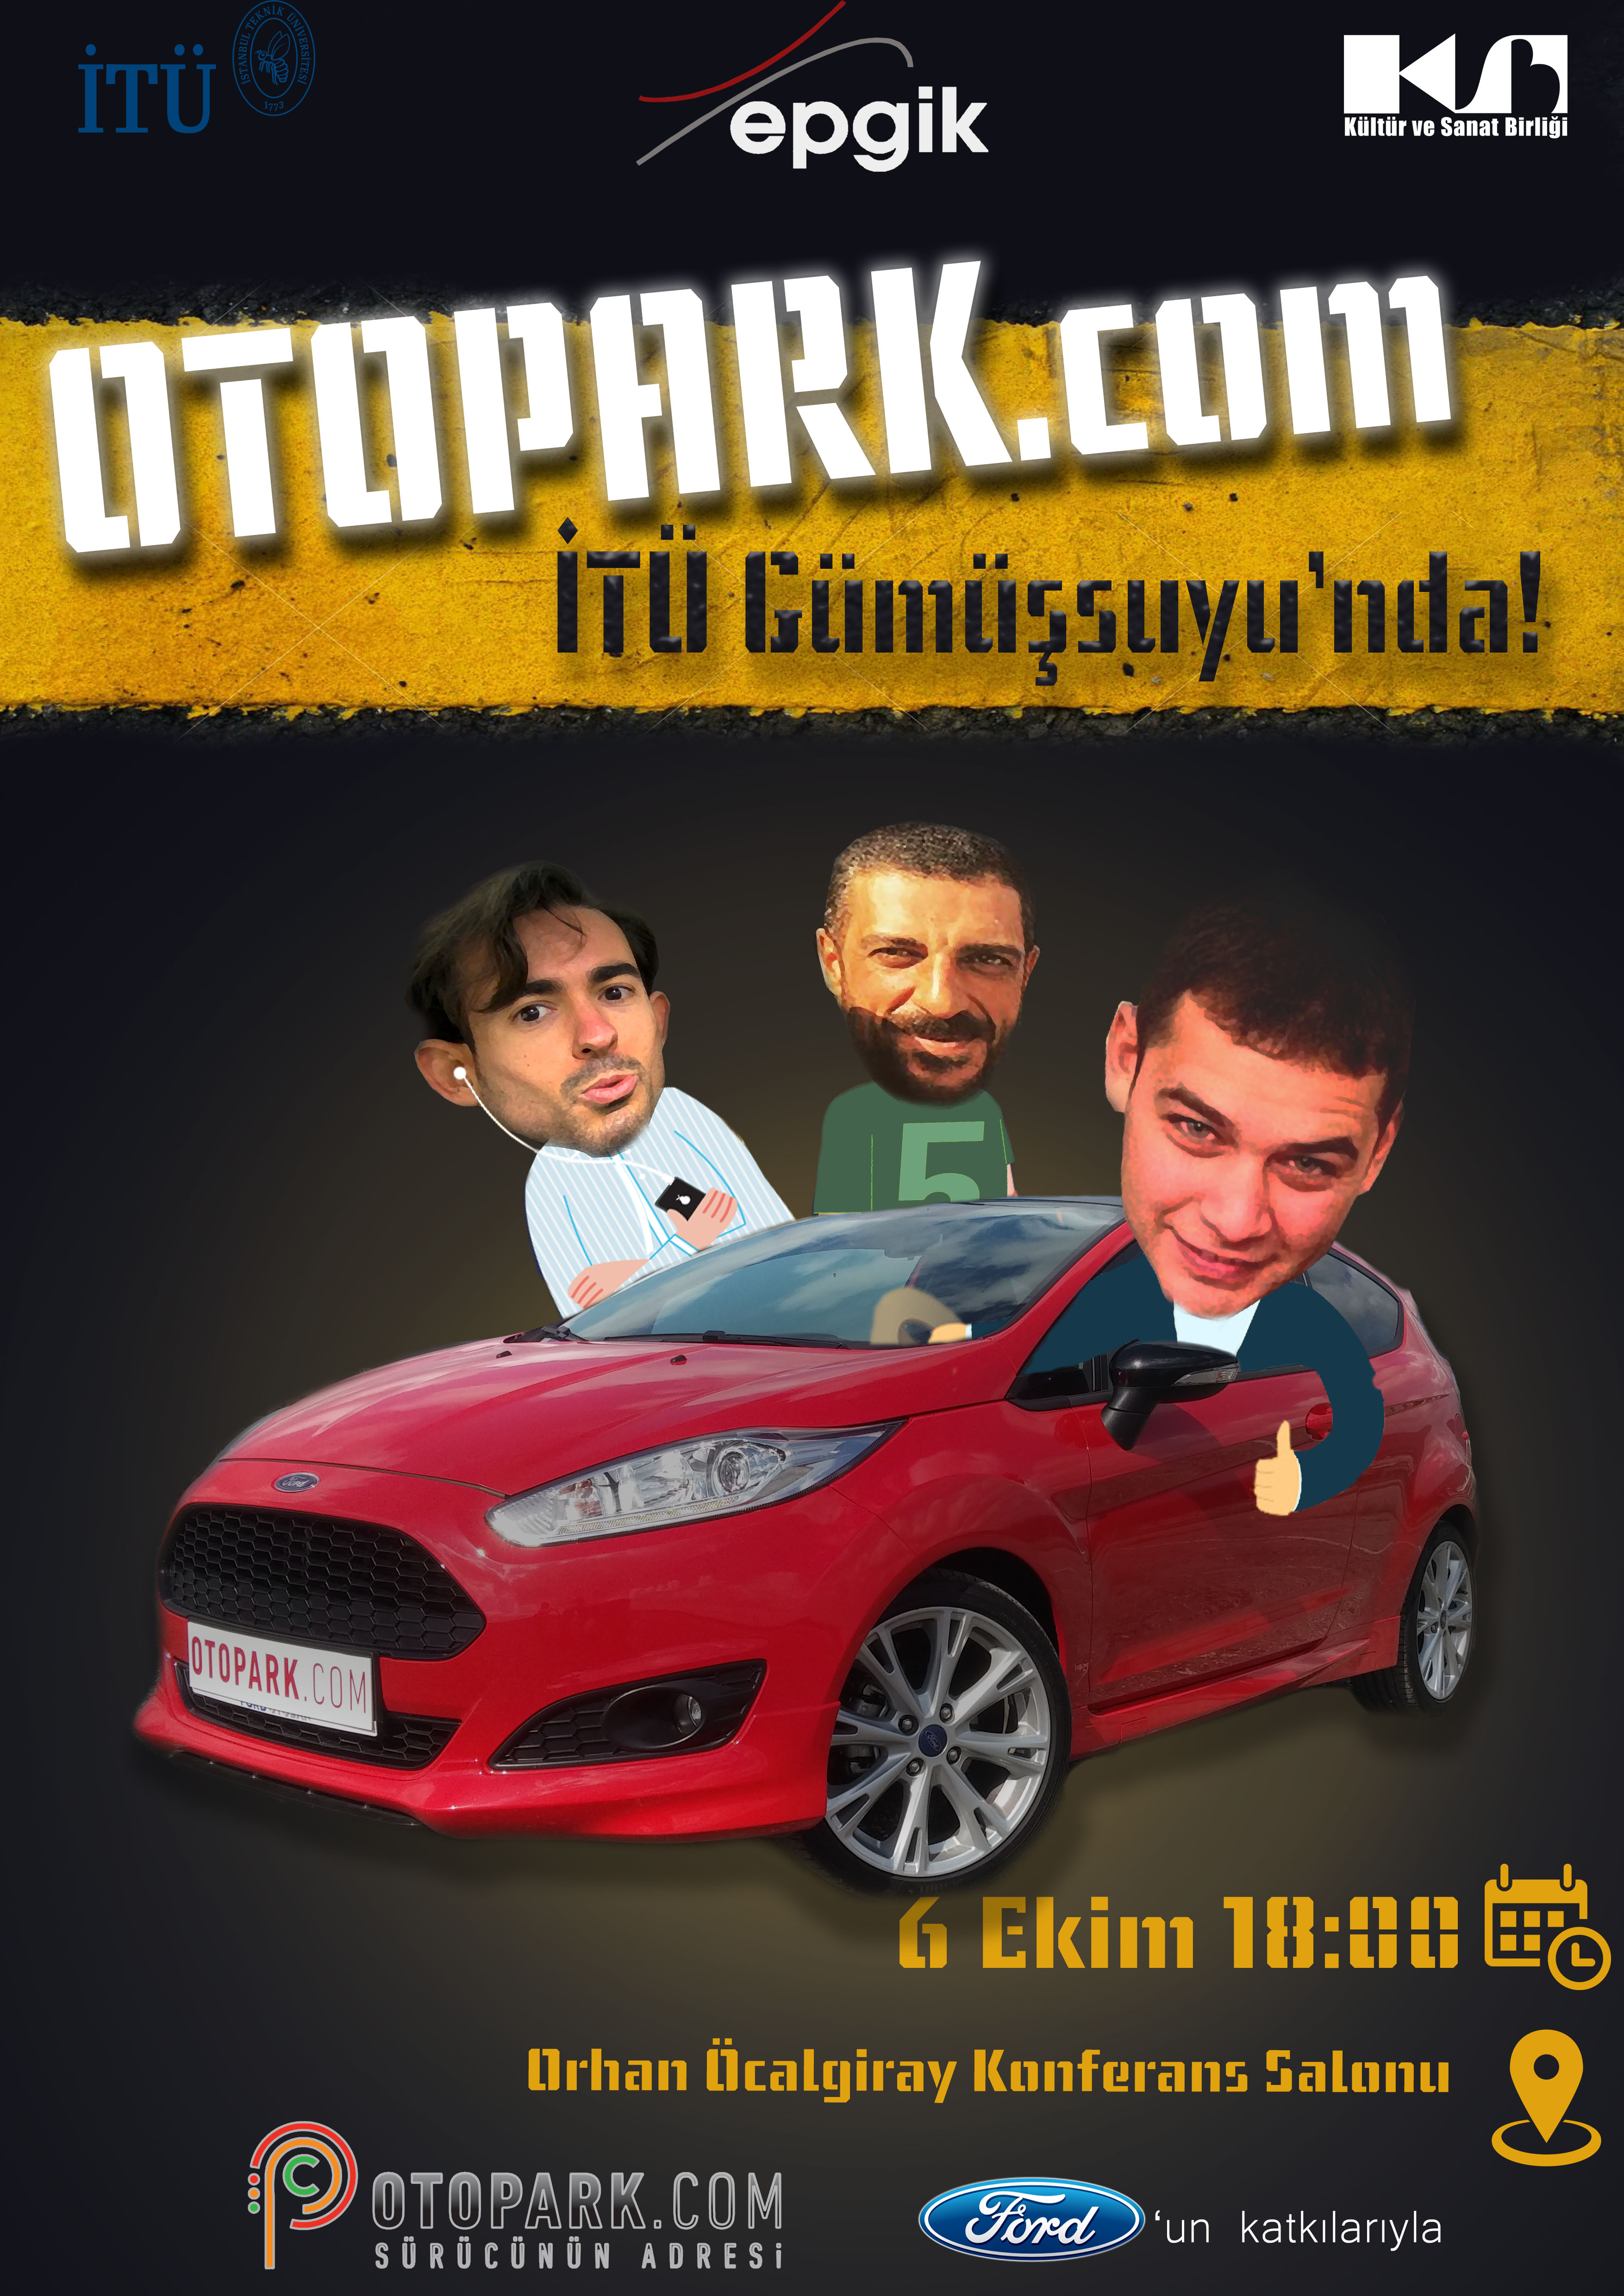 Photo of İTÜ'deyiz!